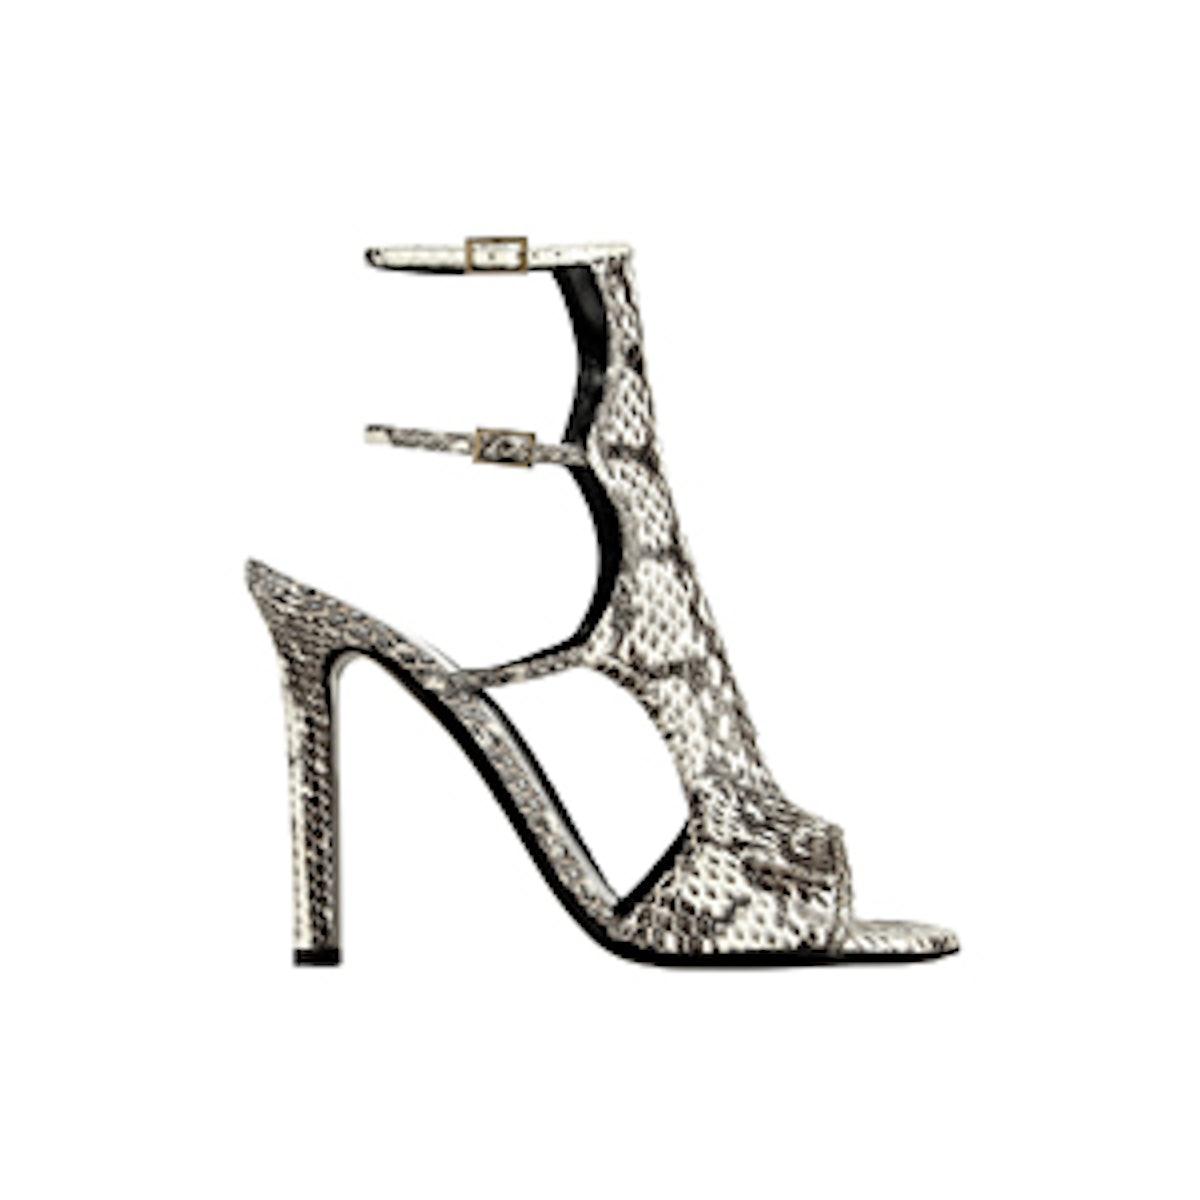 Bad Girl Printed Elaphe Sandals